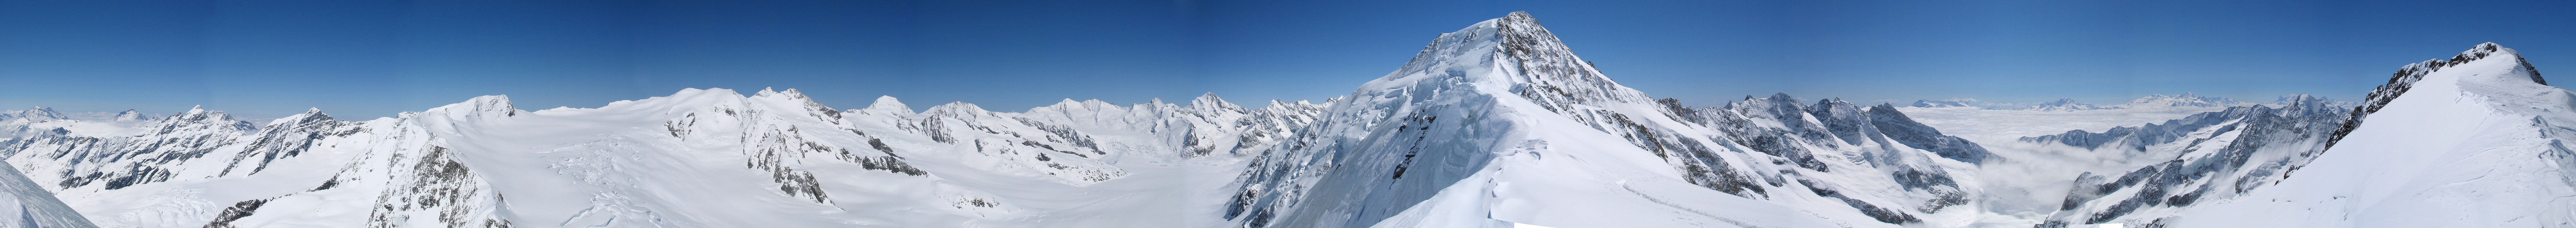 Sattelhorn Berner Alpen / Alpes bernoises Switzerland panorama 11